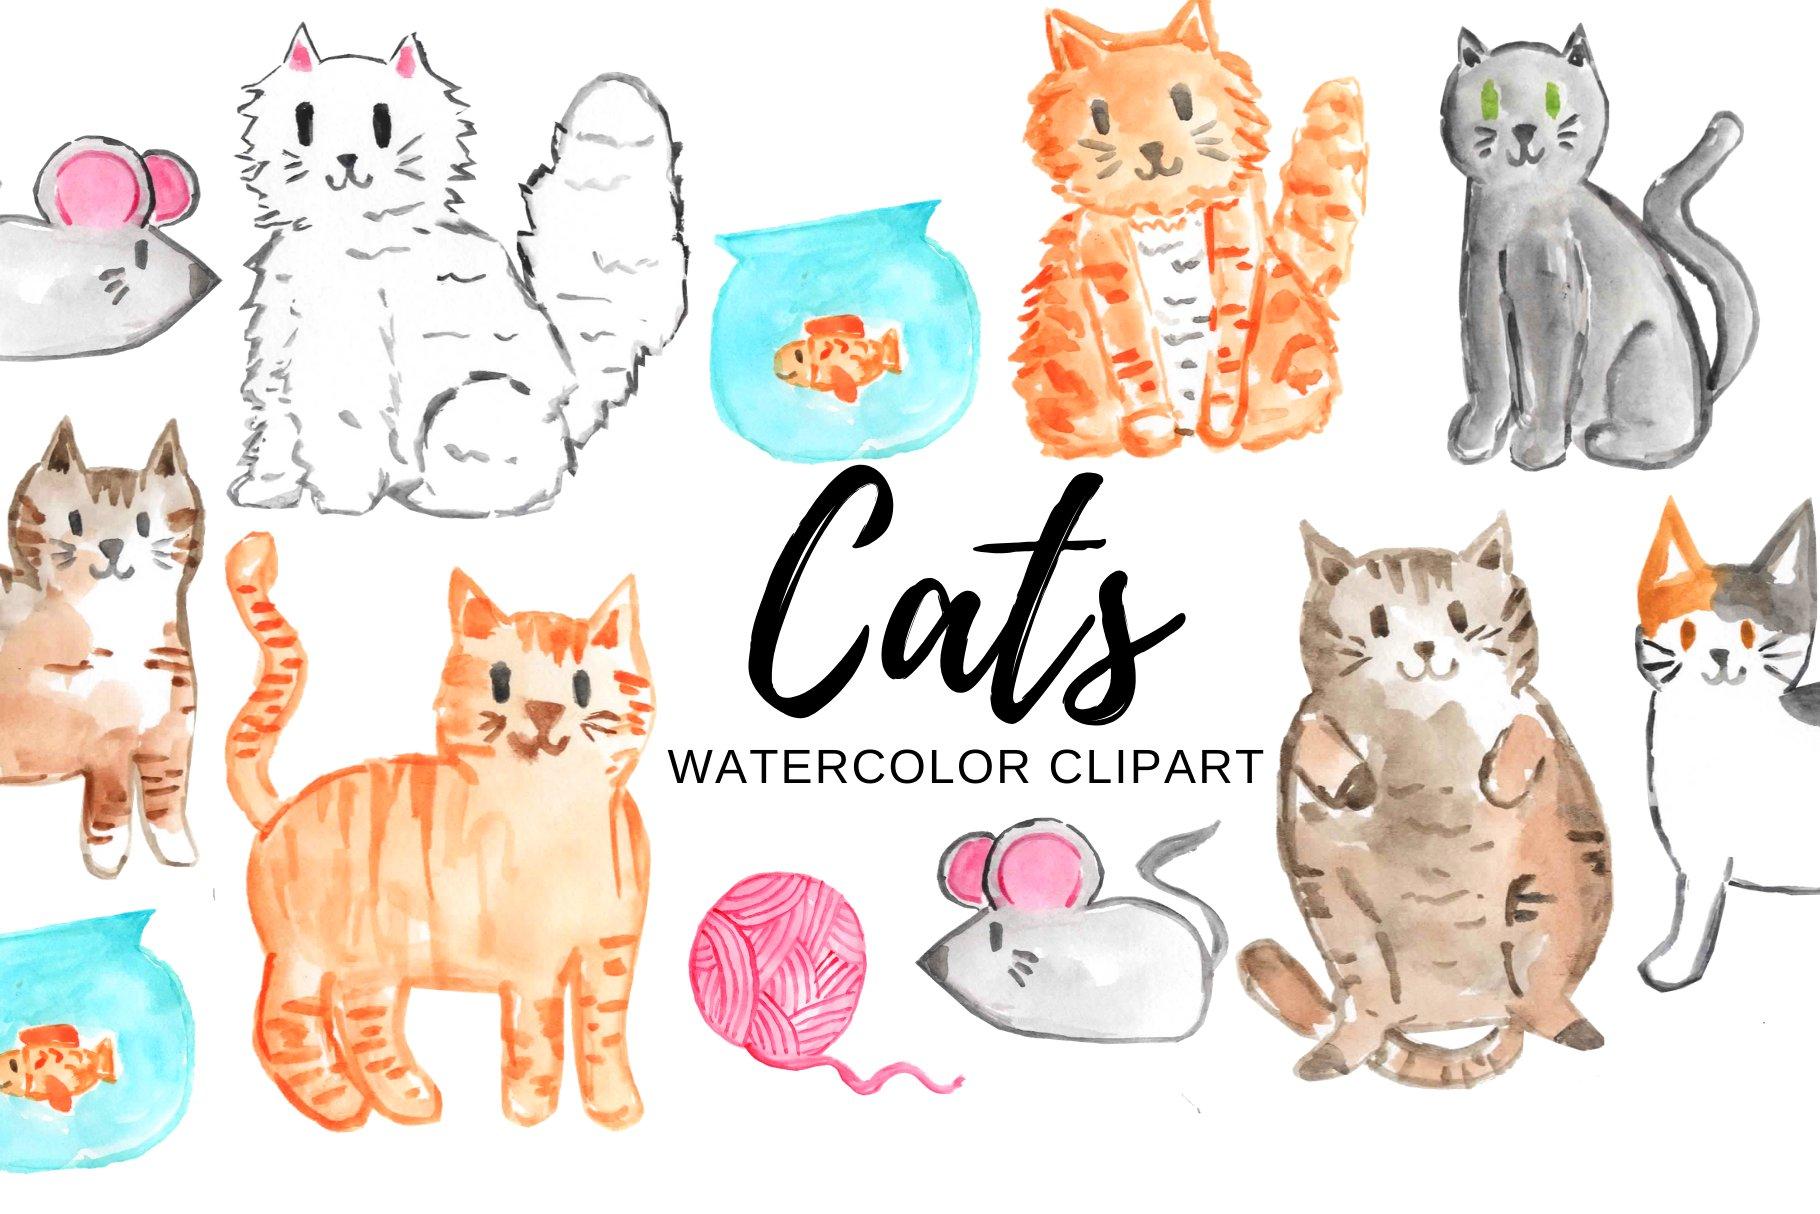 Cartoon Christmas Cats Holiday Card | Christmas cats, Christmas paintings,  Christmas characters